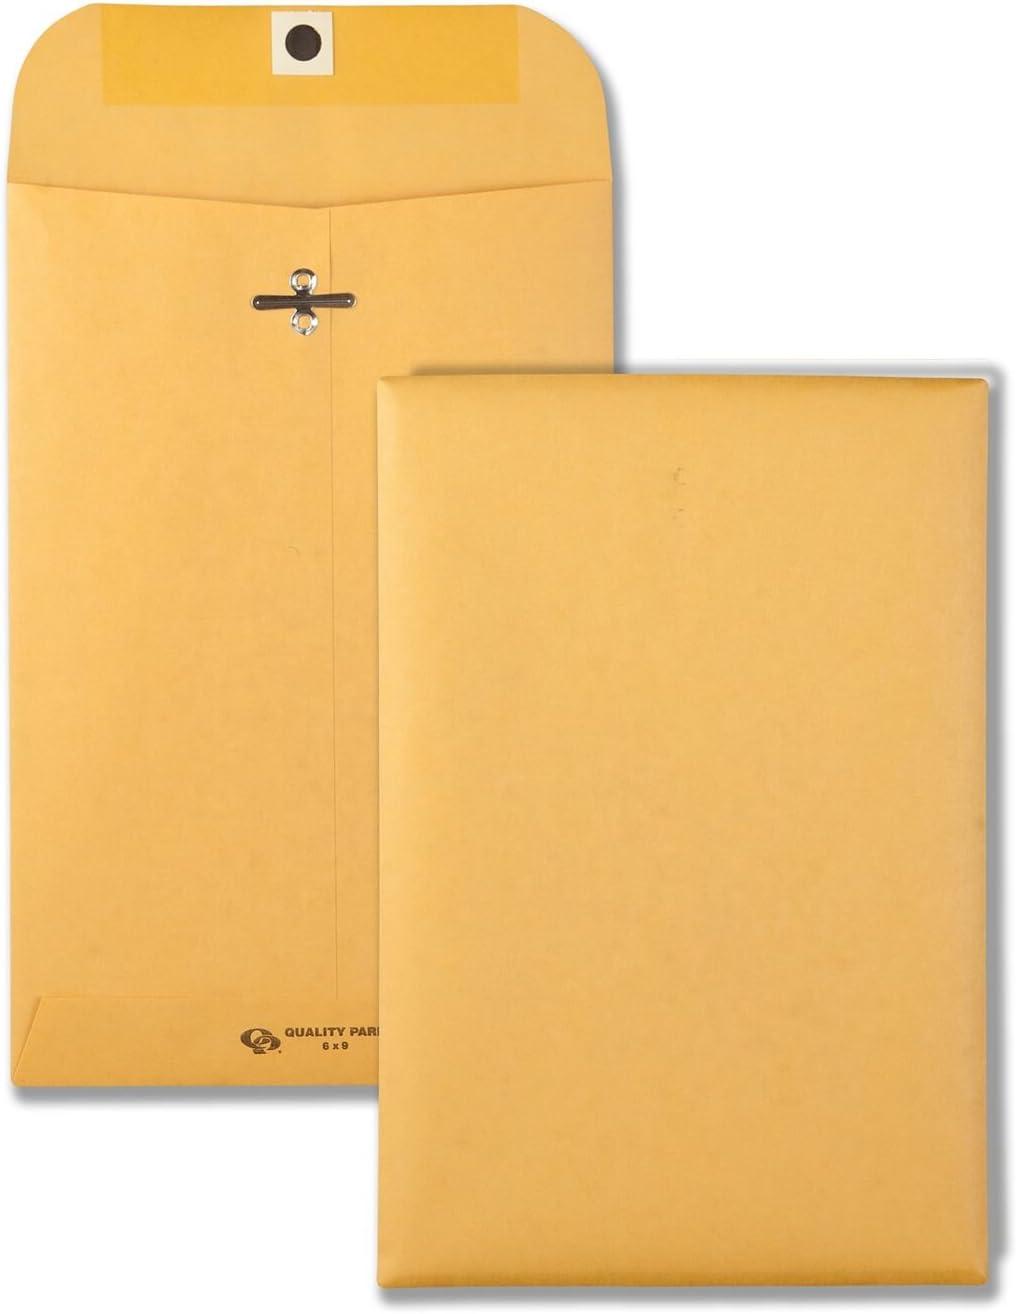 Quality Park 6 x 9 Clasp Envelopes, Clasp and Gummed Closures for Storing or Mailing, 28 lb Kraft Paper, 100 per Box (QUA37855)